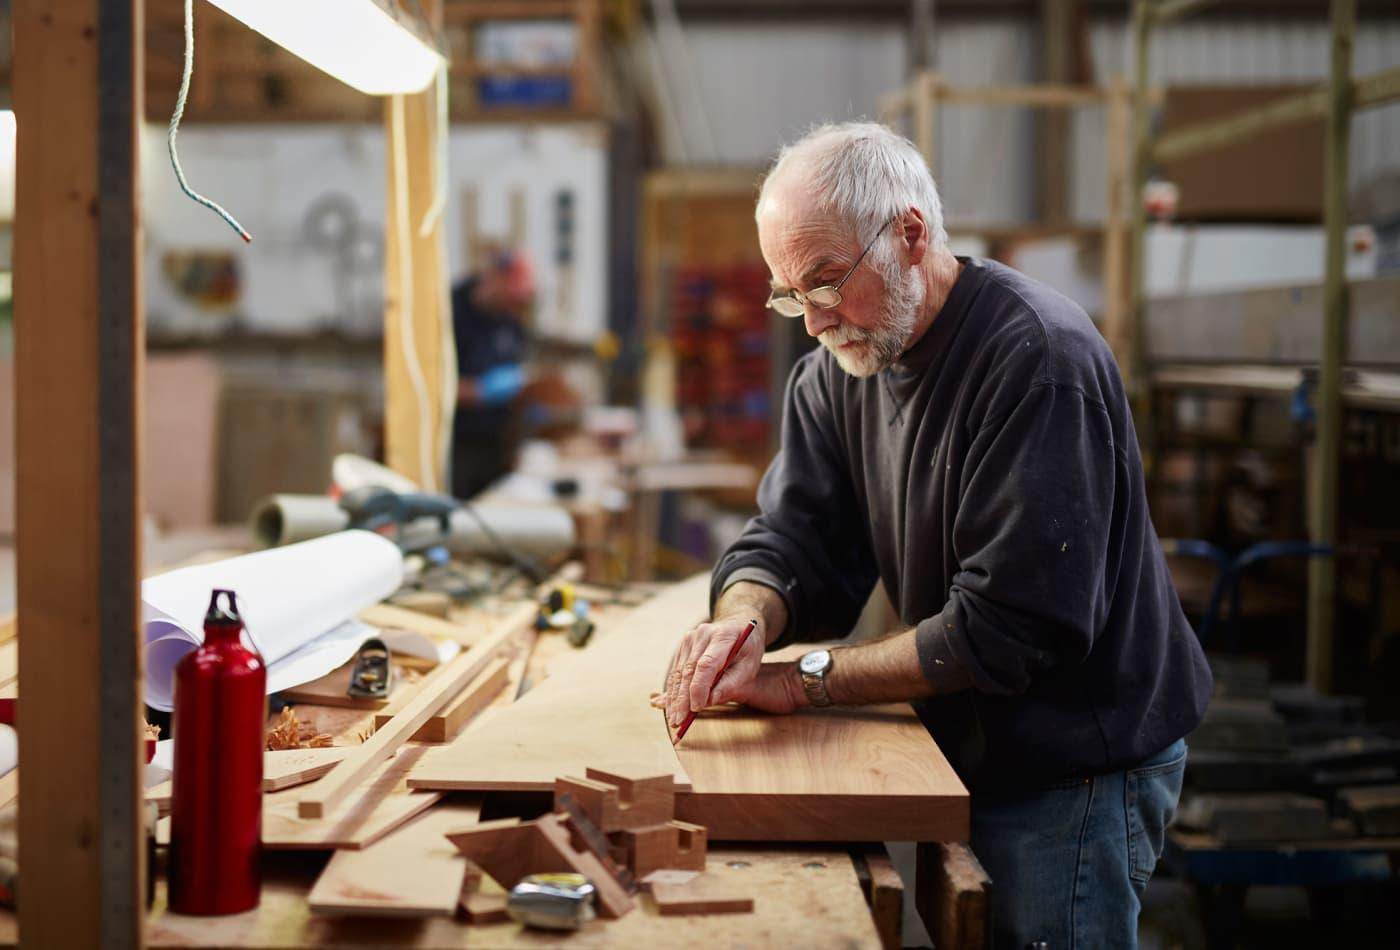 6 key steps to retiring next year